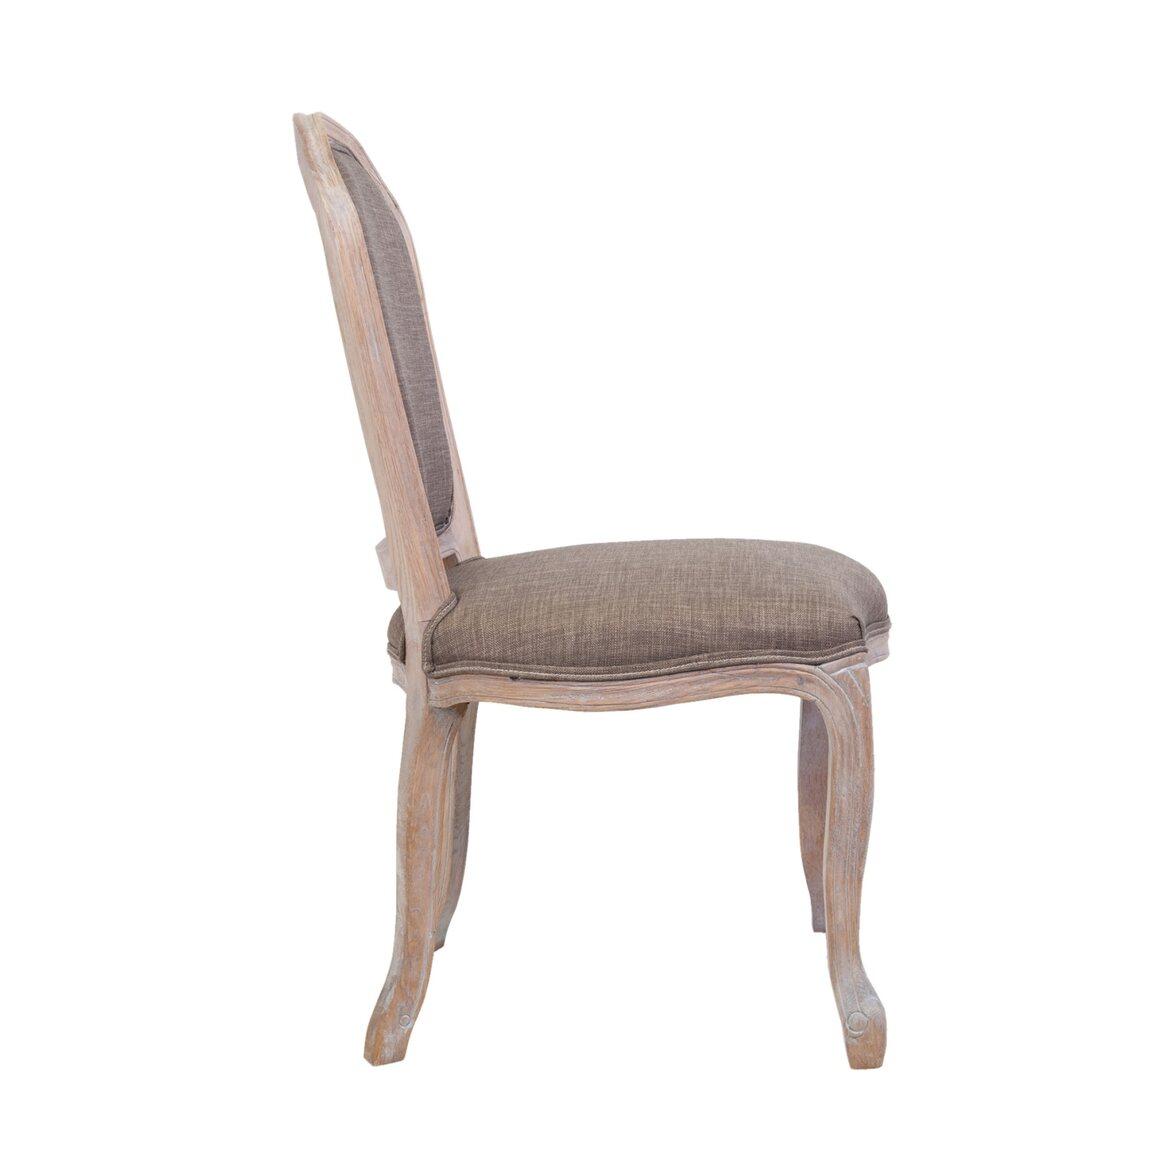 Стул Granes brown 2   Обеденные стулья Kingsby